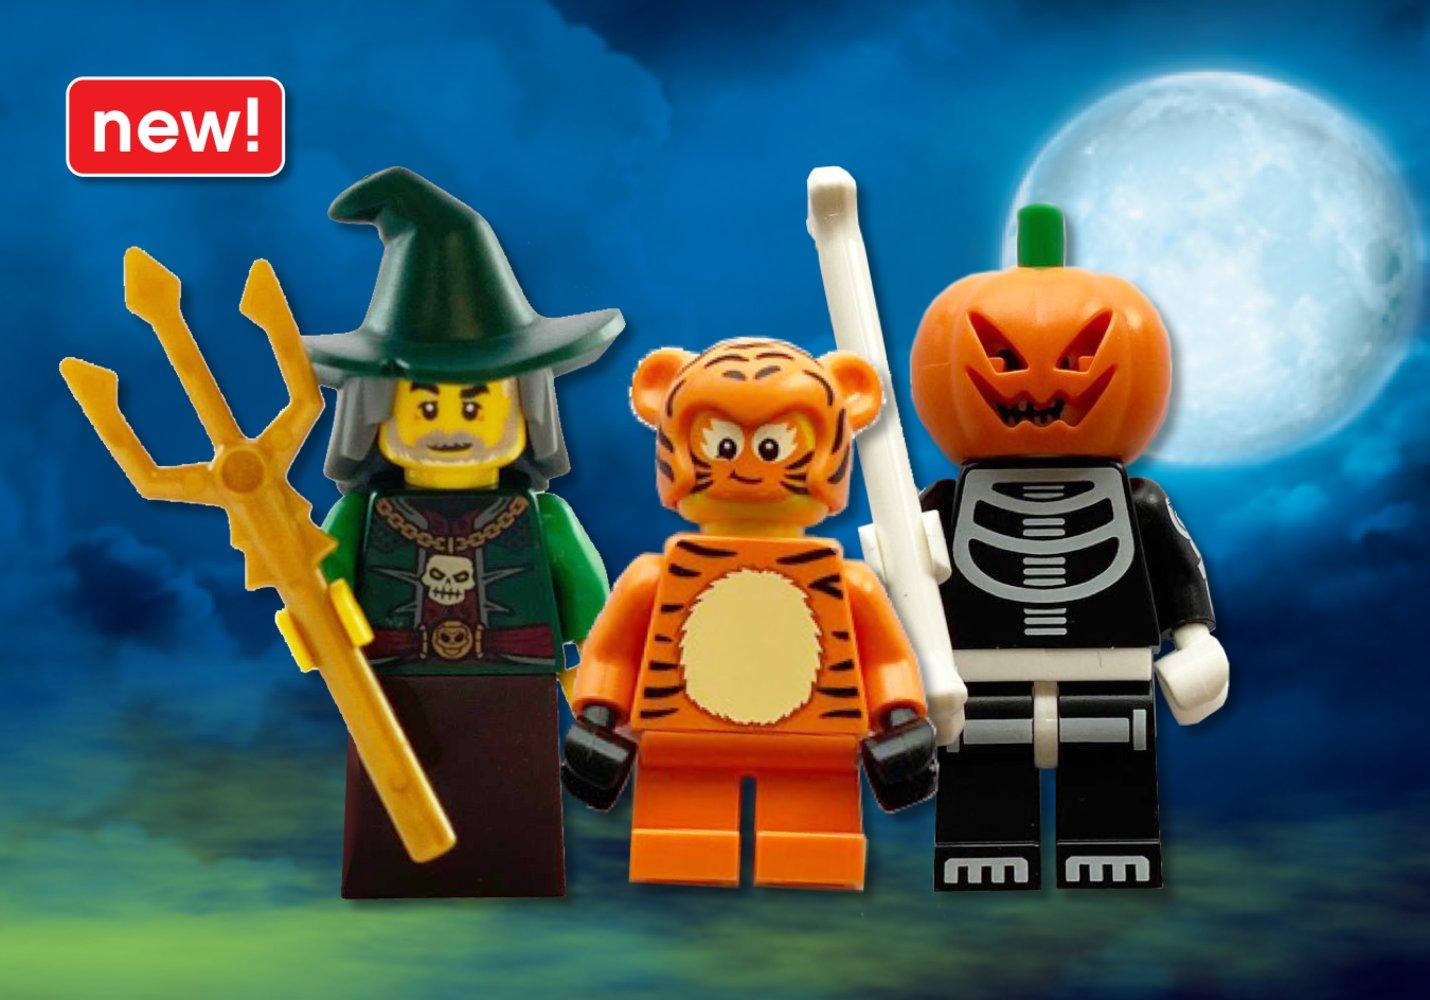 Halloween Minifigure Collection